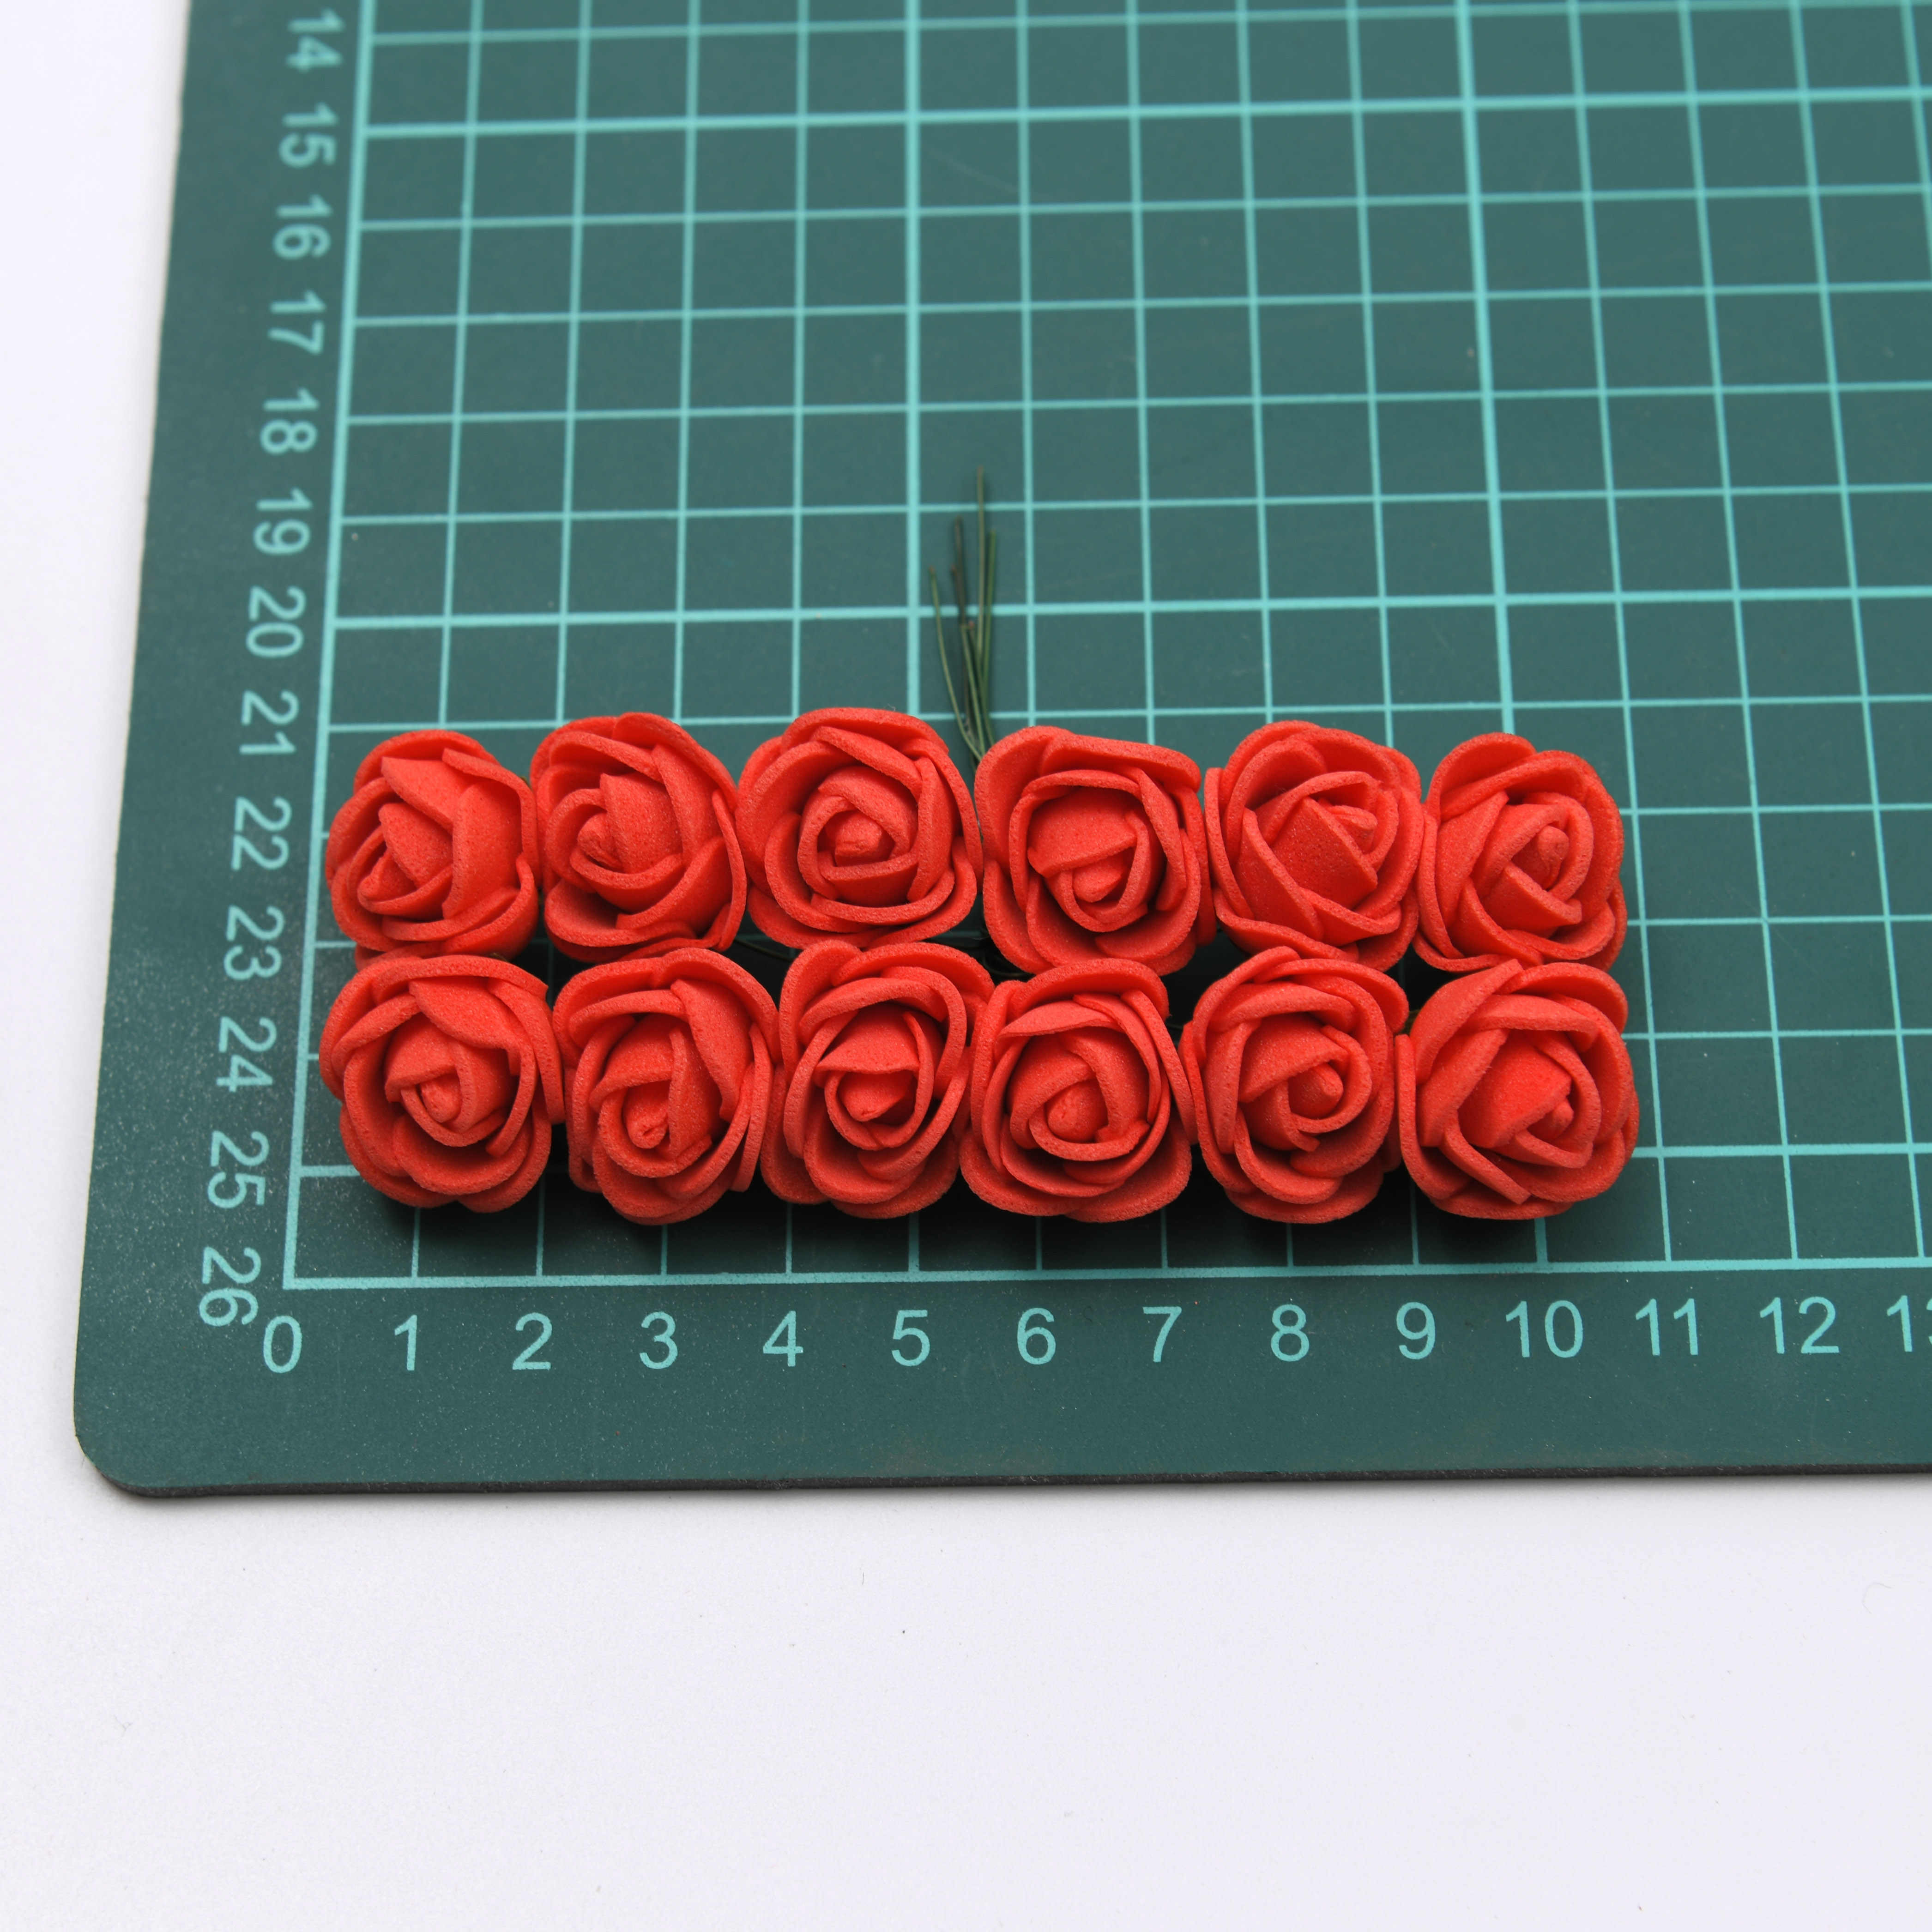 144PCS/72PCS/12PCS 2 ซม.Mini Foam Roseดอกไม้ประดิษฐ์ดอกไม้งานแต่งงานตกแต่งDIYพวงหรีดคริสต์มาสปลอมRose